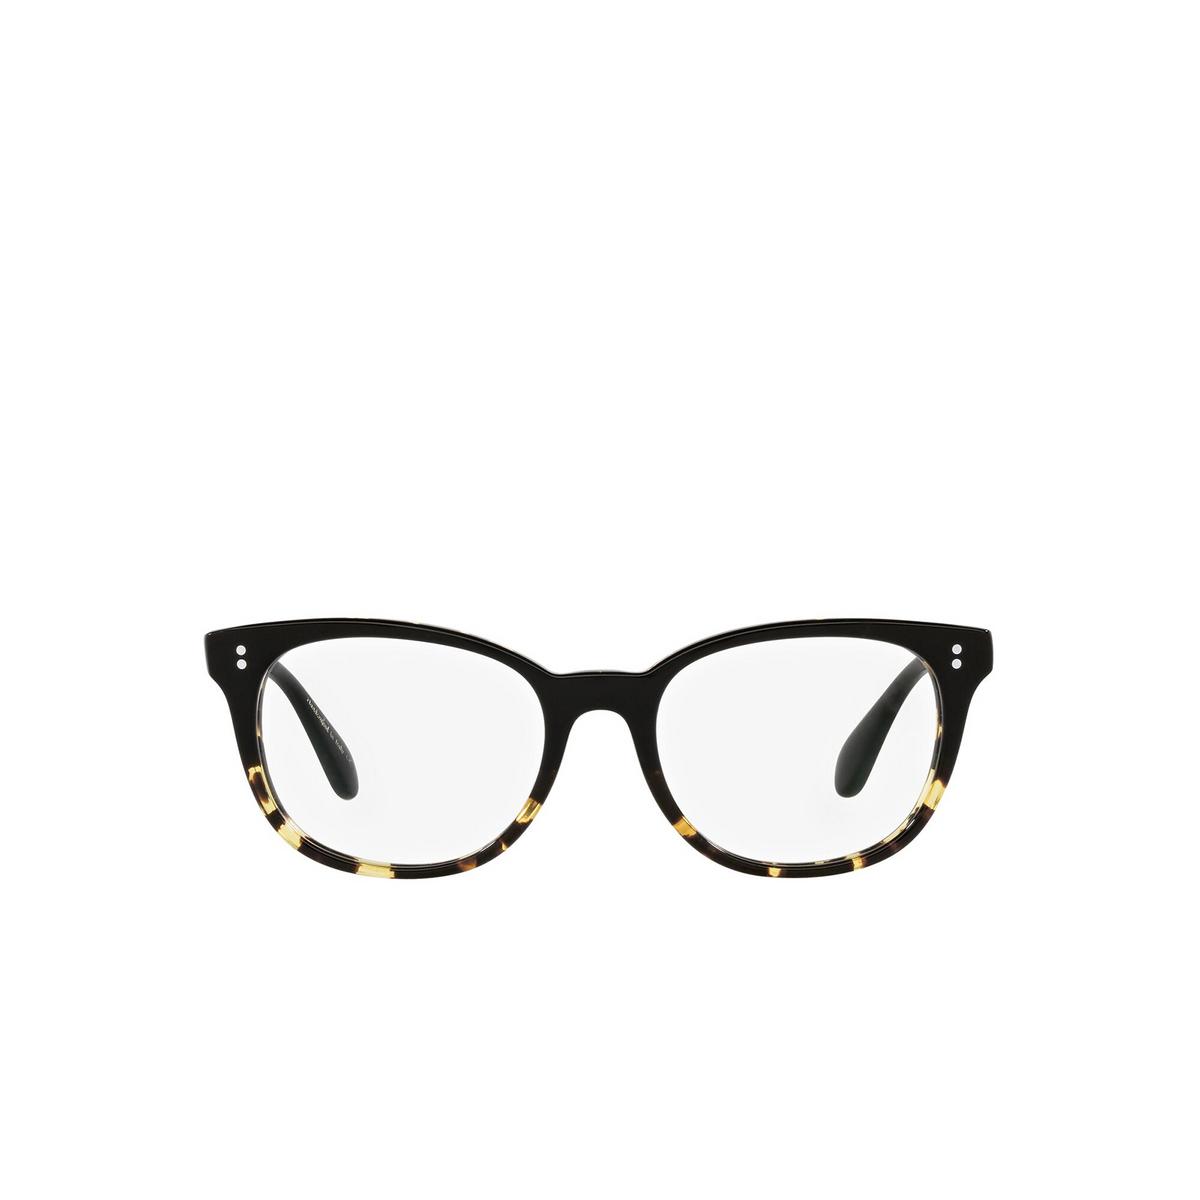 Oliver Peoples® Cat-eye Eyeglasses: Hildie OV5457U color Black / Dtbk Gradient 1178 - front view.